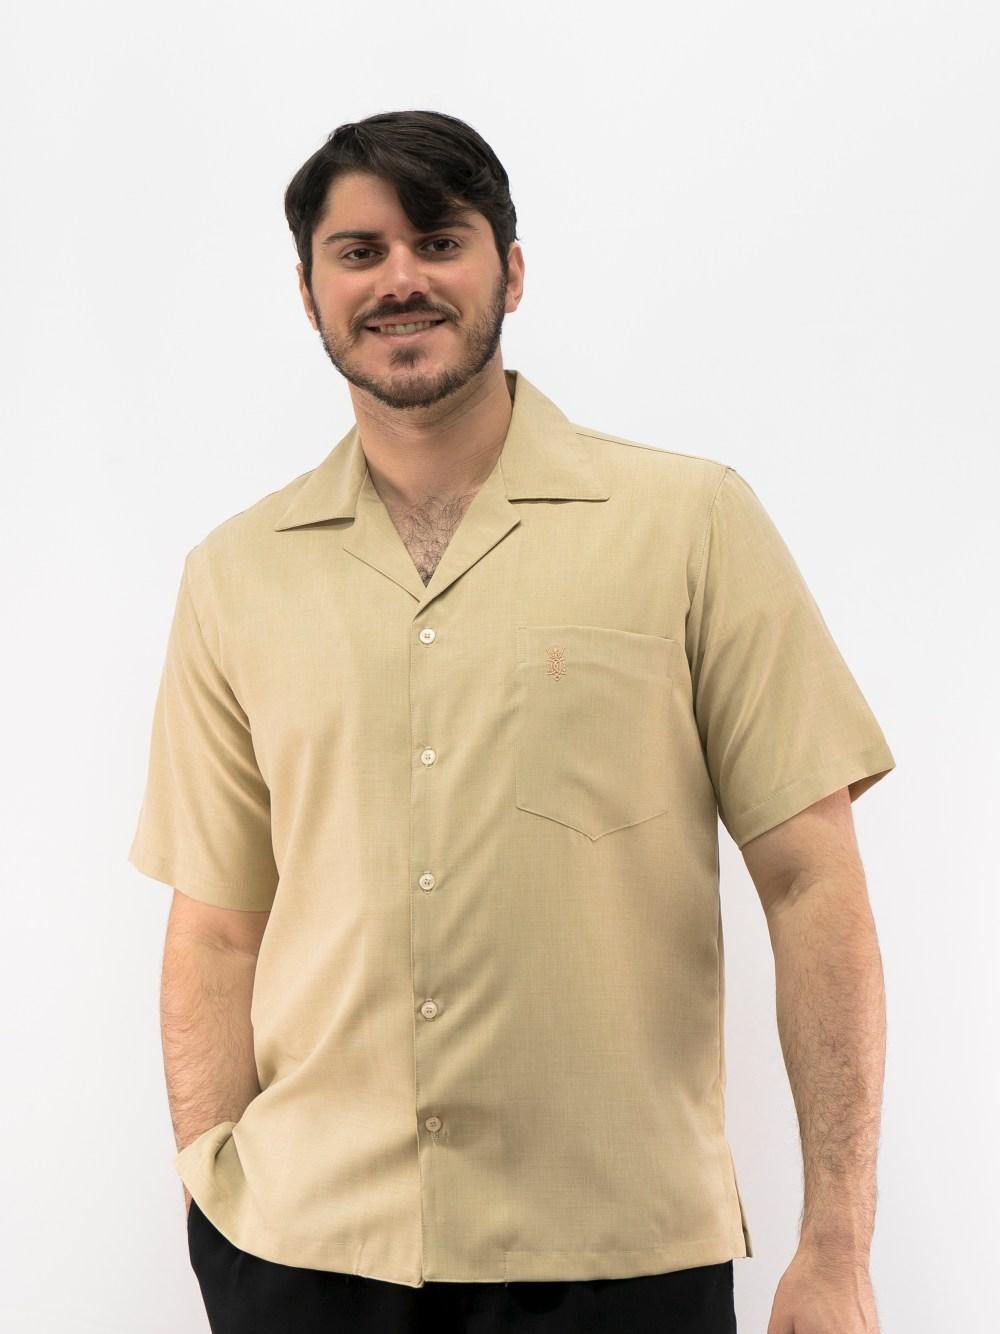 D'Accord Men's Casual Shirt Beige 5152 Made in USA - Guayabera ...